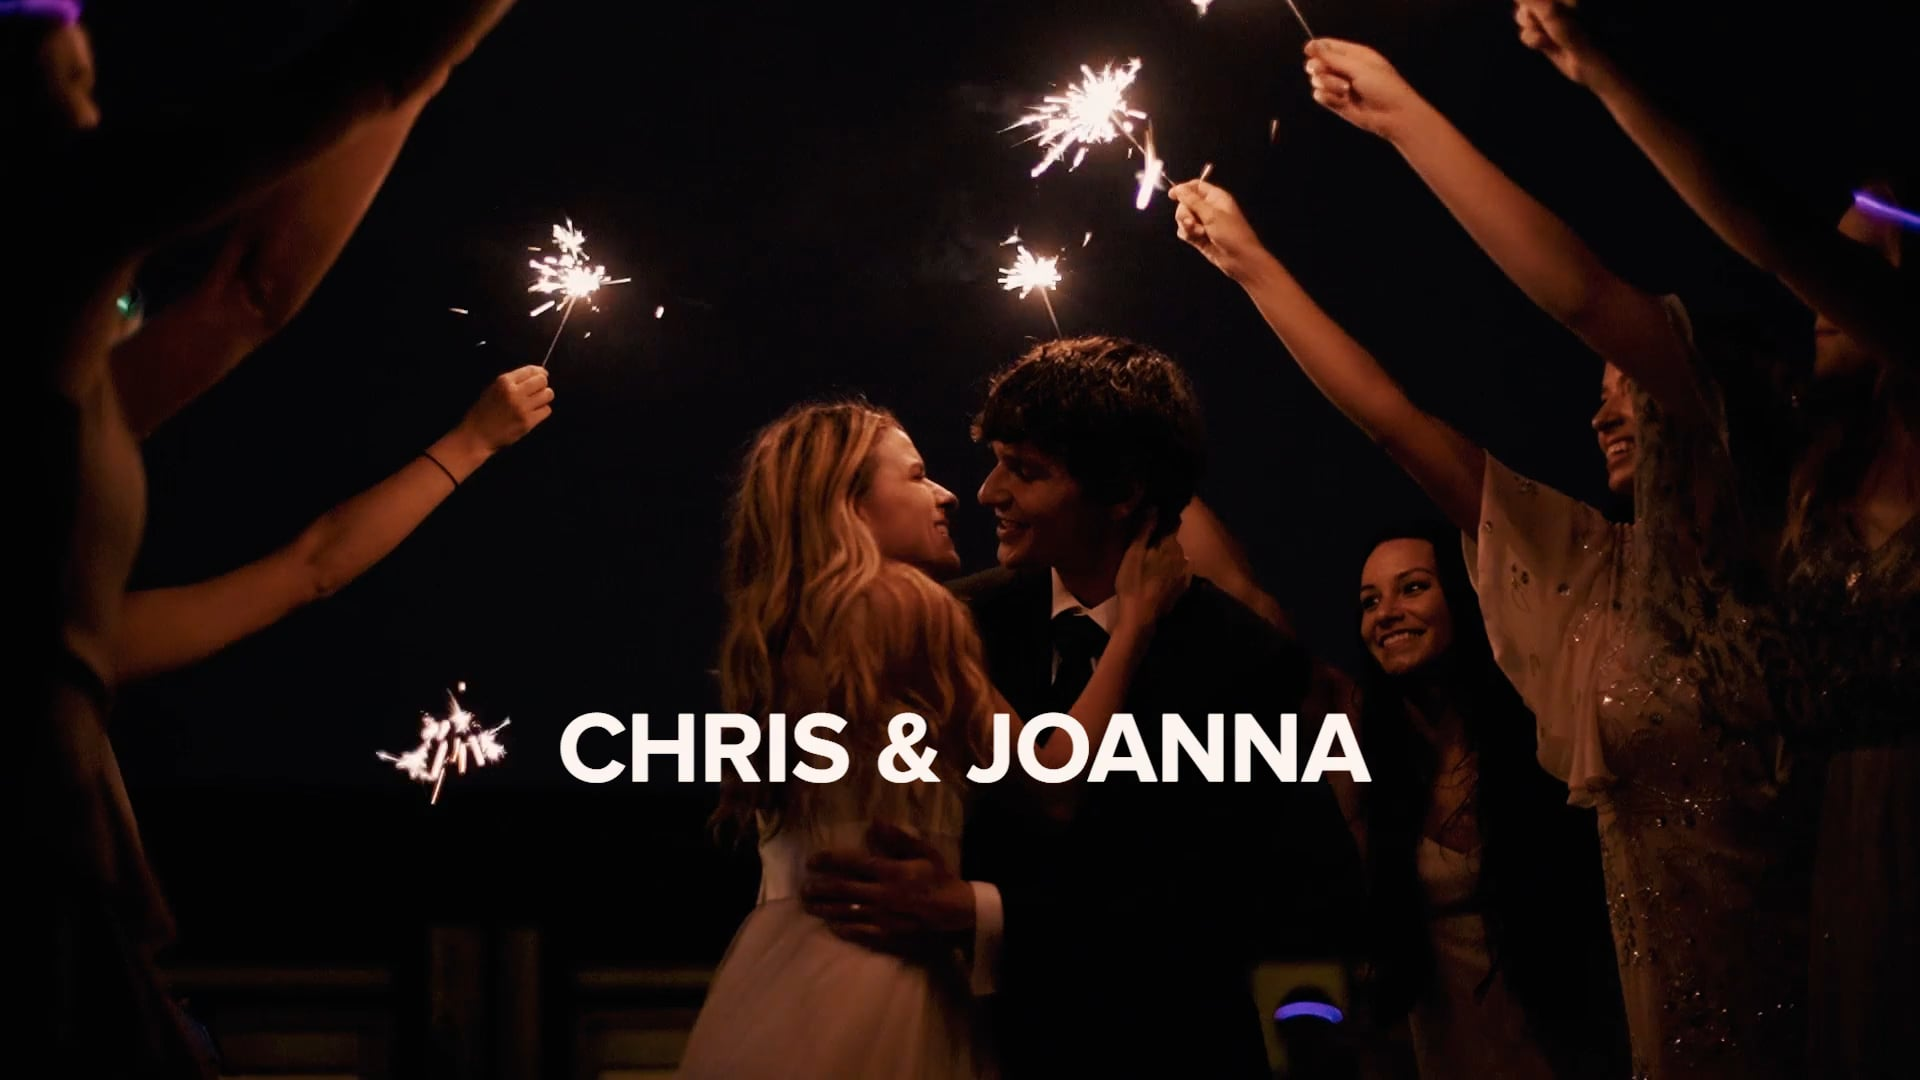 Chris & Joanna